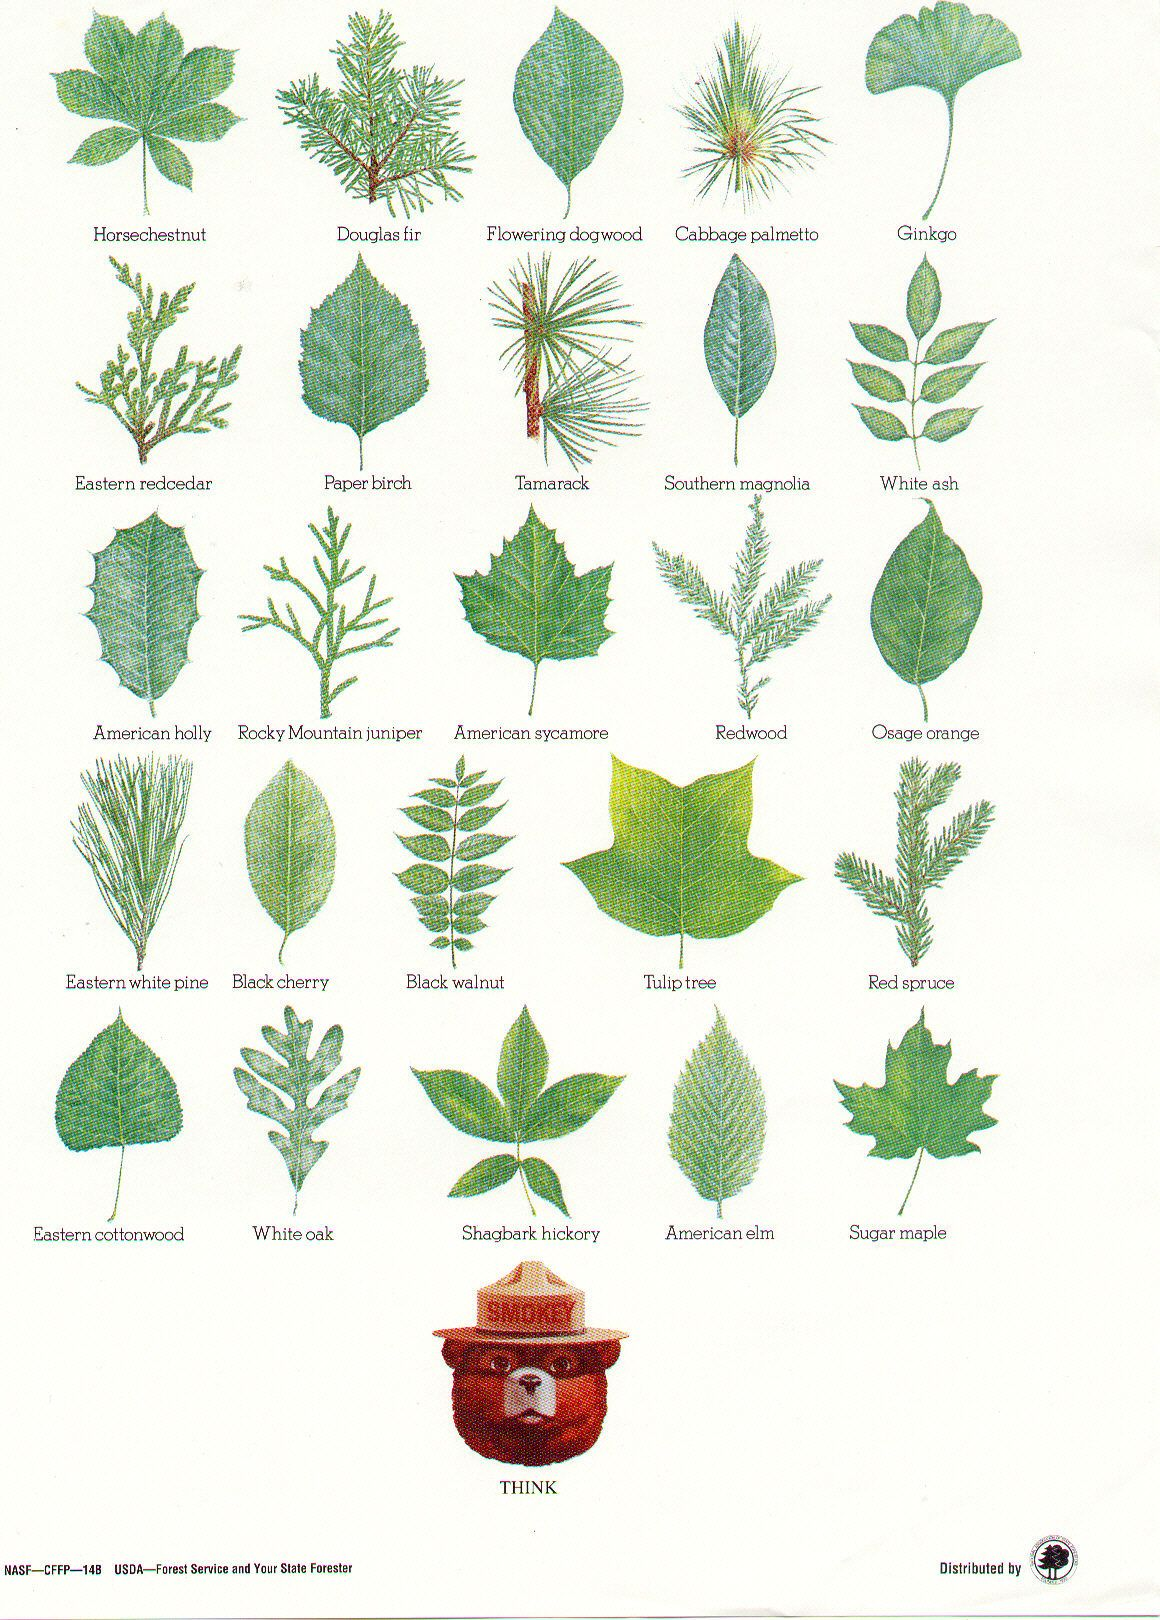 Hardwood Tree Identification By Leaf